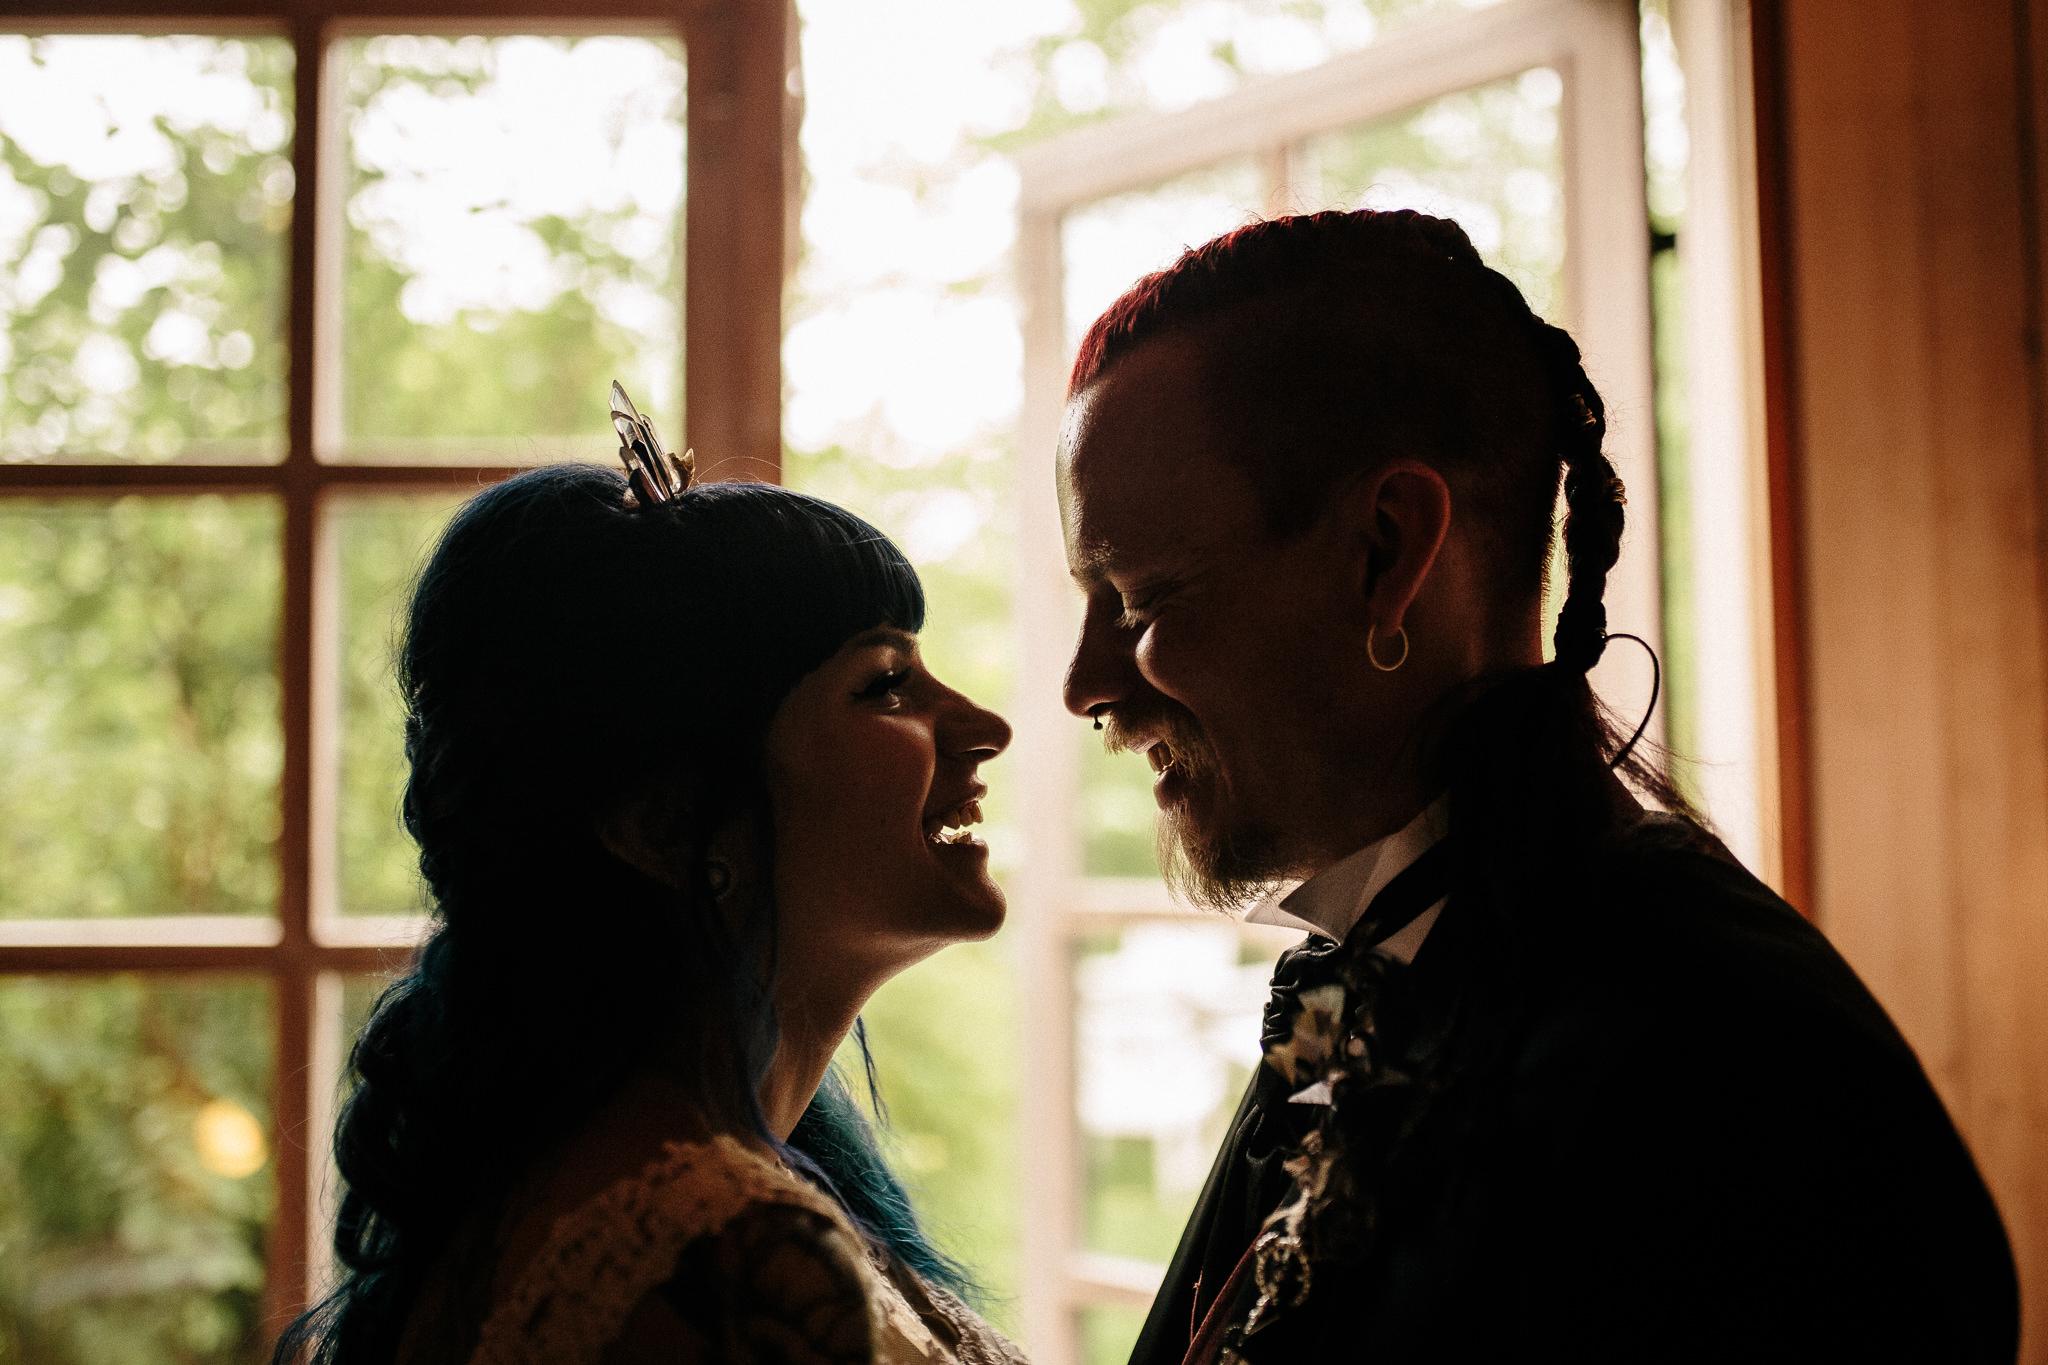 Ceren & Jani - Finland Wedding Photographer - Weddings by Qay - Wedding Photographer (56 of 166).jpg